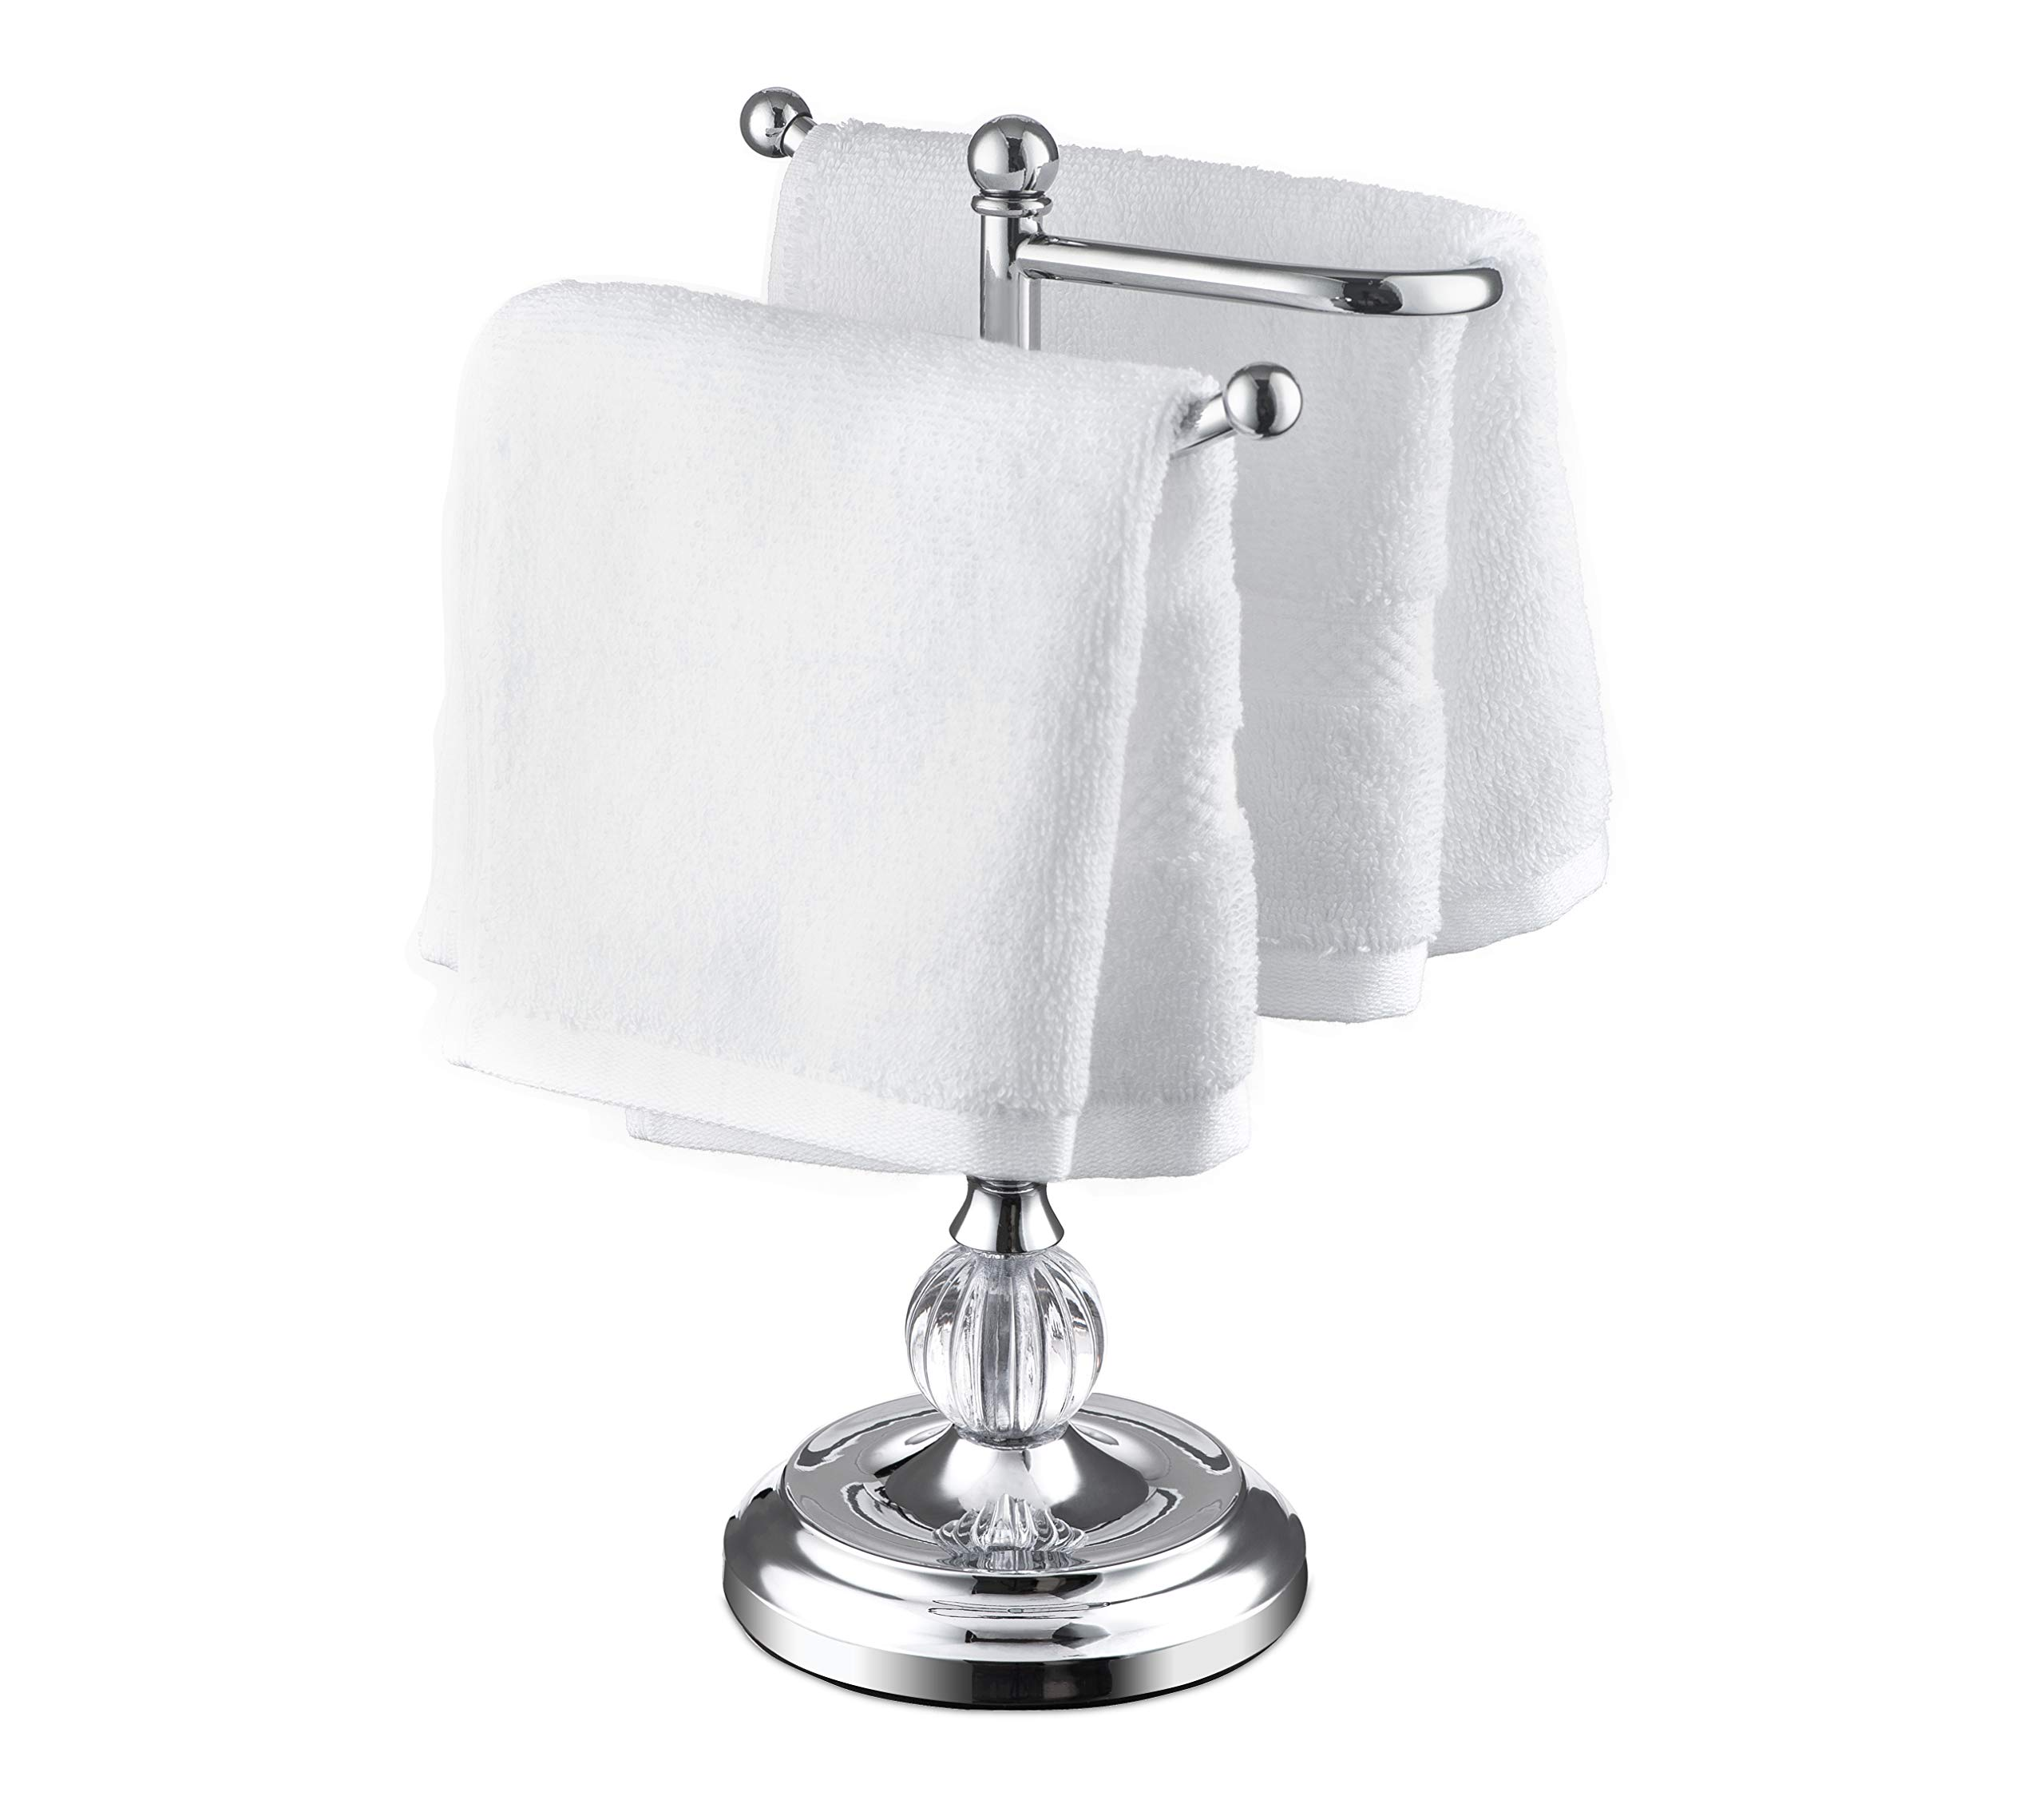 AMG and Enchante Accessories, Free Standing Fingertip Hand Towel Bar Holder Tree Rack, TT108A CHR, Chrome